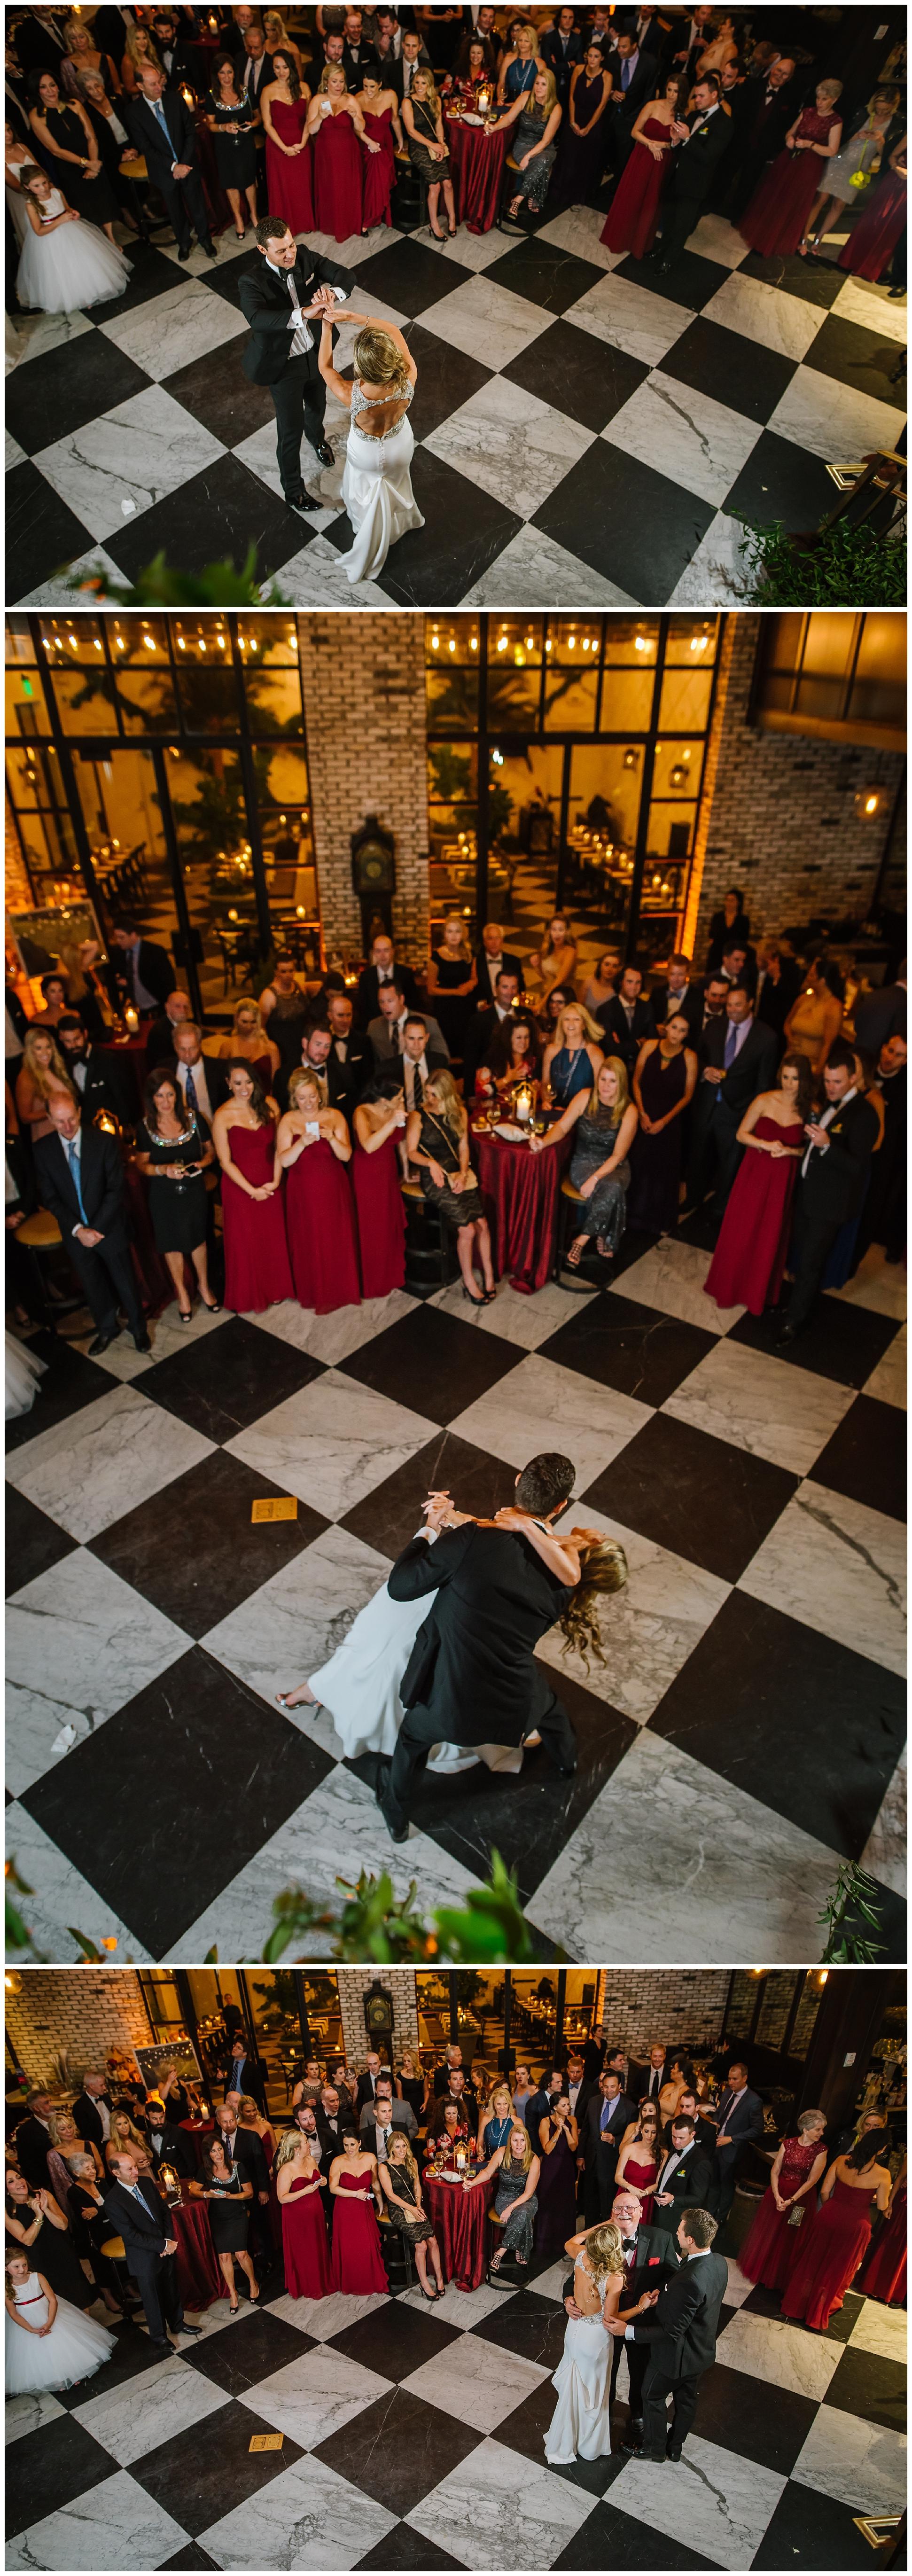 Oxford-exchange-wedding-photogapher-garland-candels-bookstore-burgandy-botanica_0056.jpg